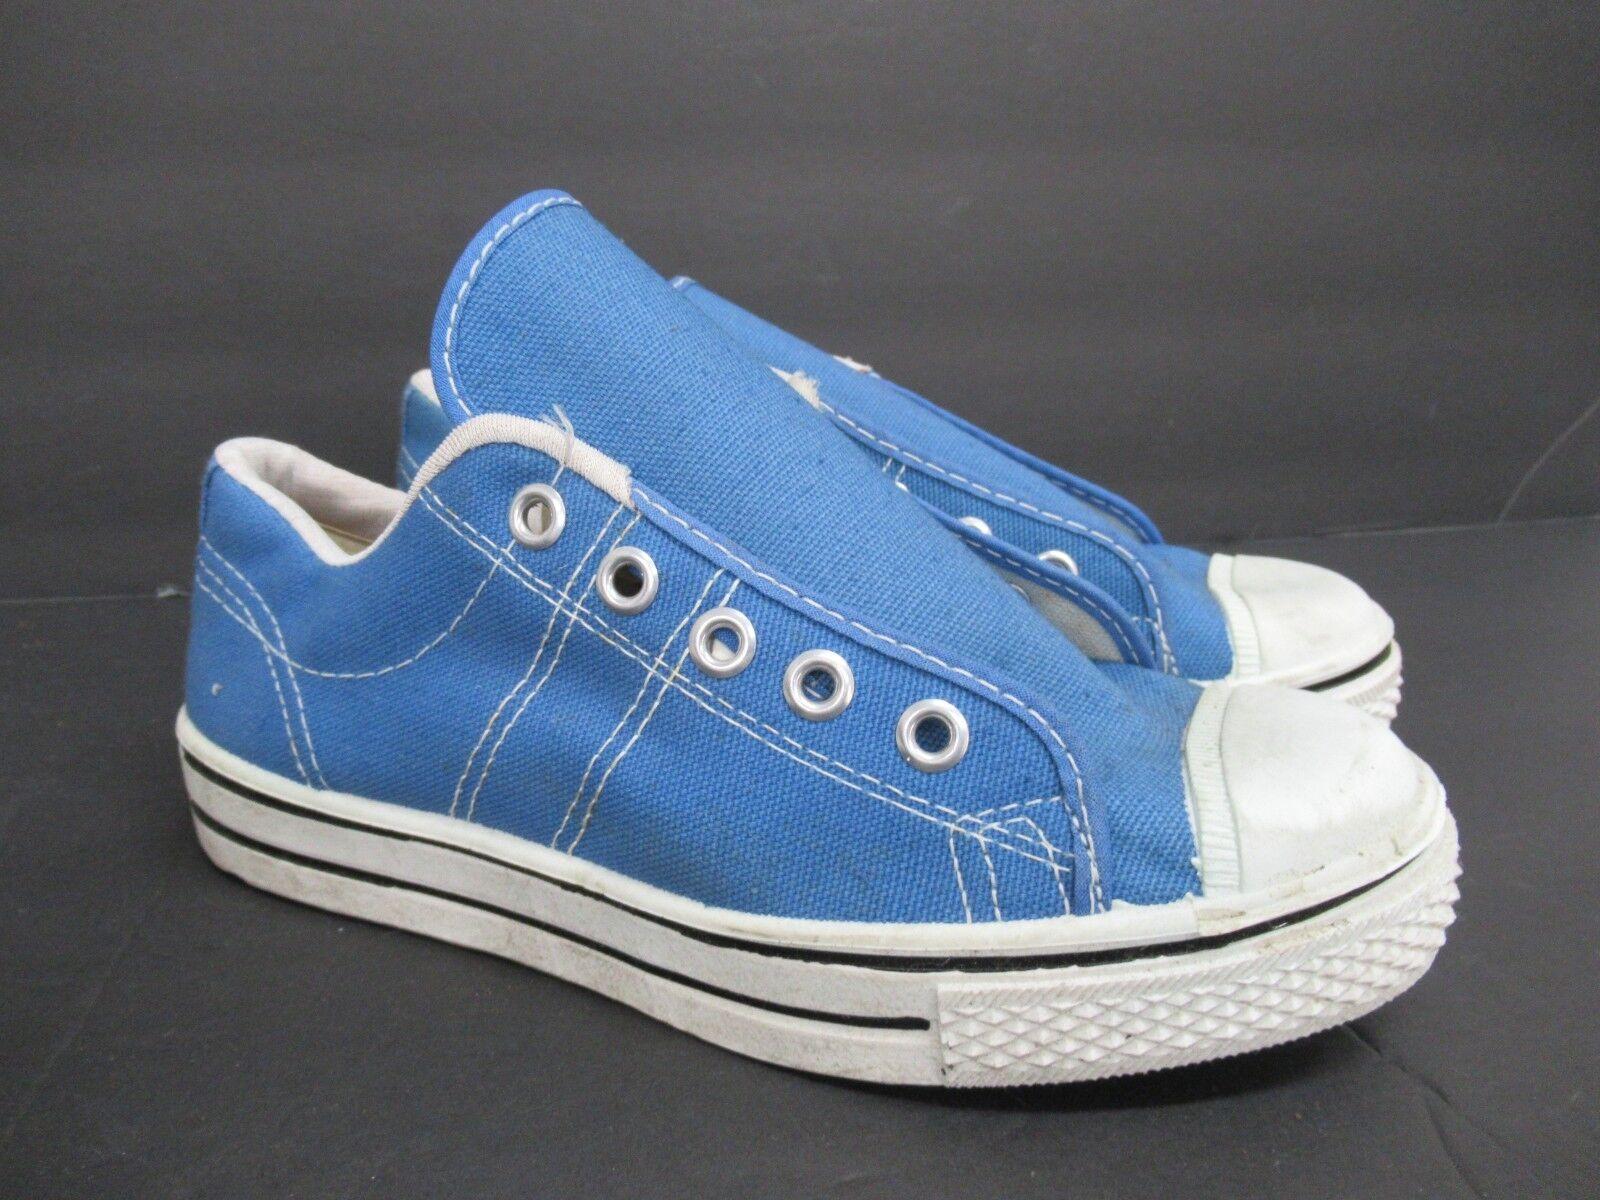 Vintage Retro Light Converse in Light Retro Blau Canvas Schuhes 60s/70s Kids' Größe: 3 6c551d